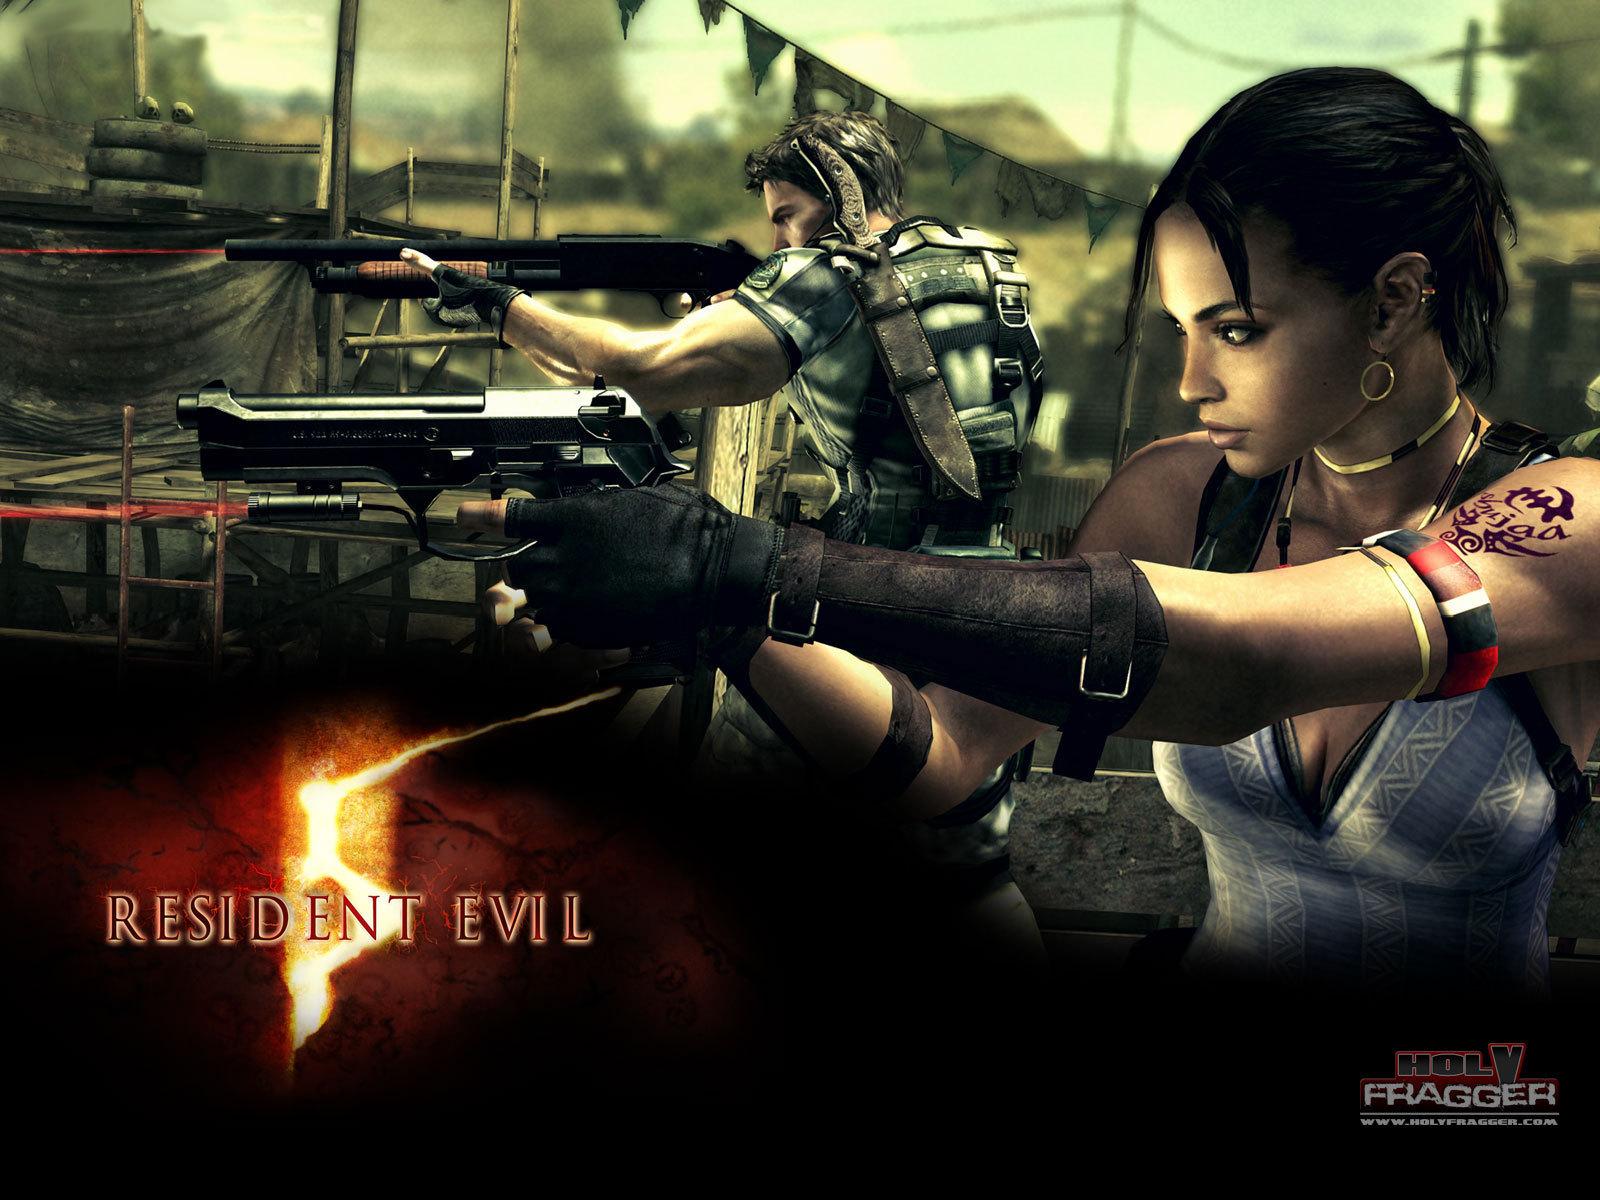 http://3.bp.blogspot.com/_9Ja9UHer9KE/TUtnAKrwkLI/AAAAAAAAACY/xKzYcq4McS0/s1600/Resident-Evil-Wallpaper-resident-evil-5-4931735-1600-1200.jpg